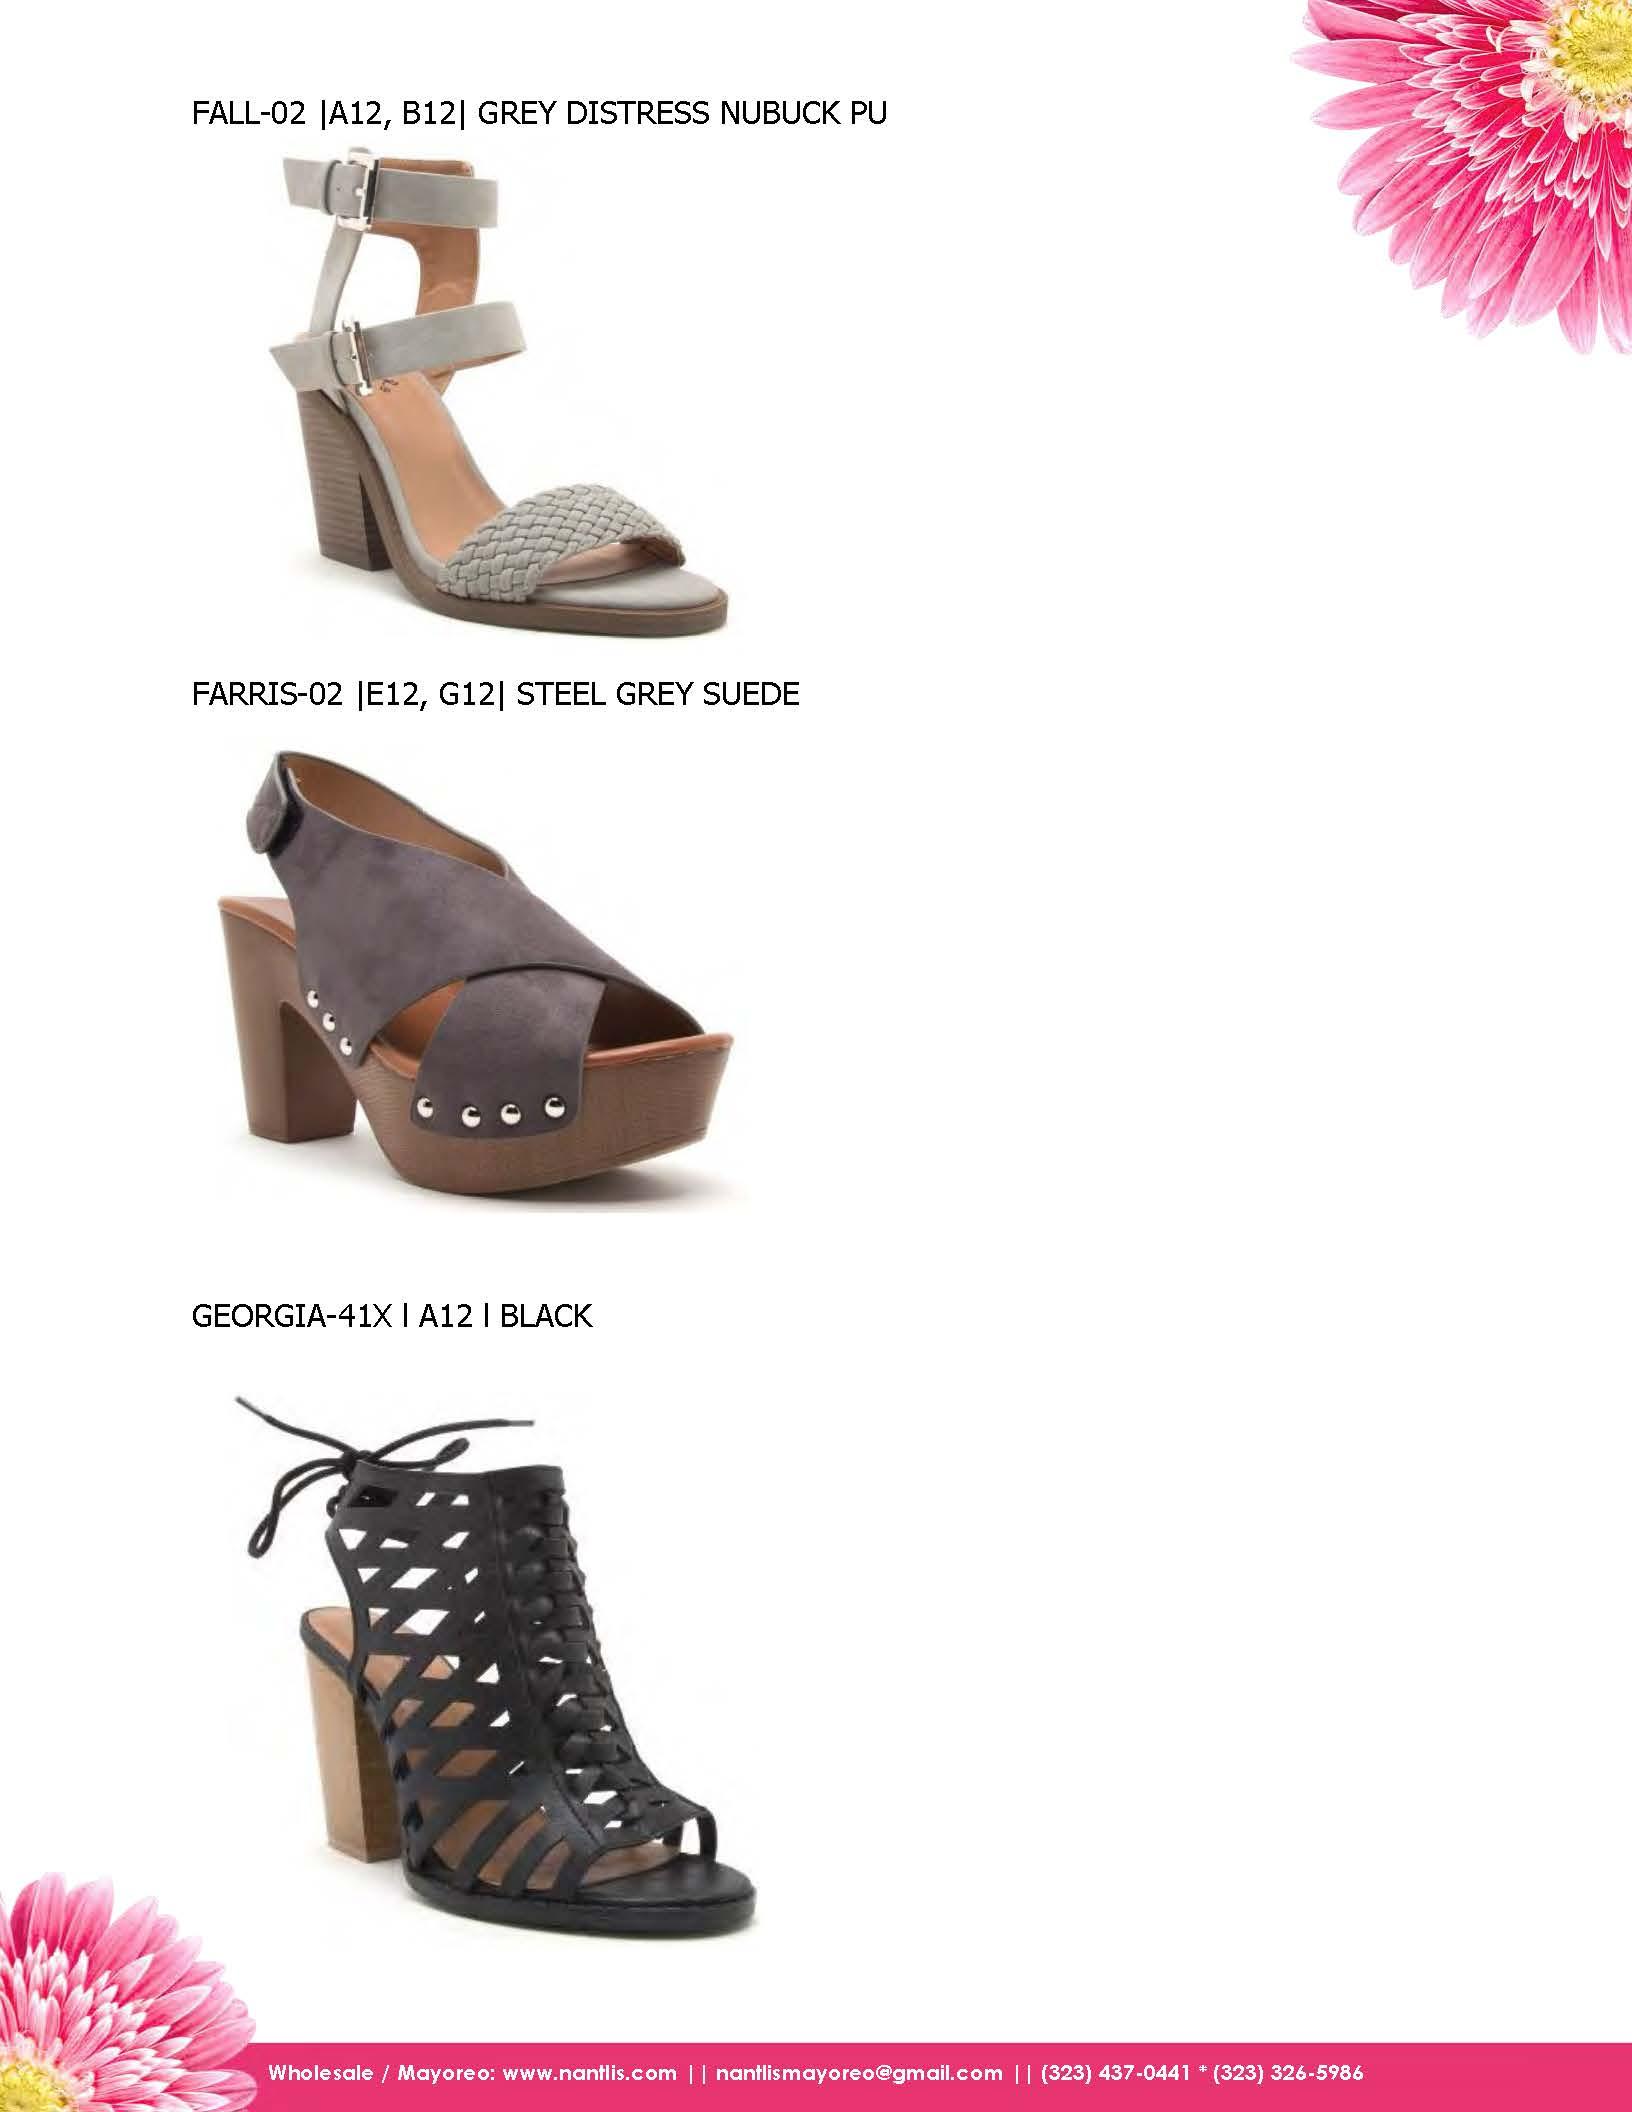 Nantlis Vol QU43 Zapatos para mujer mayoreo Wholesale shoes for women_Page_21